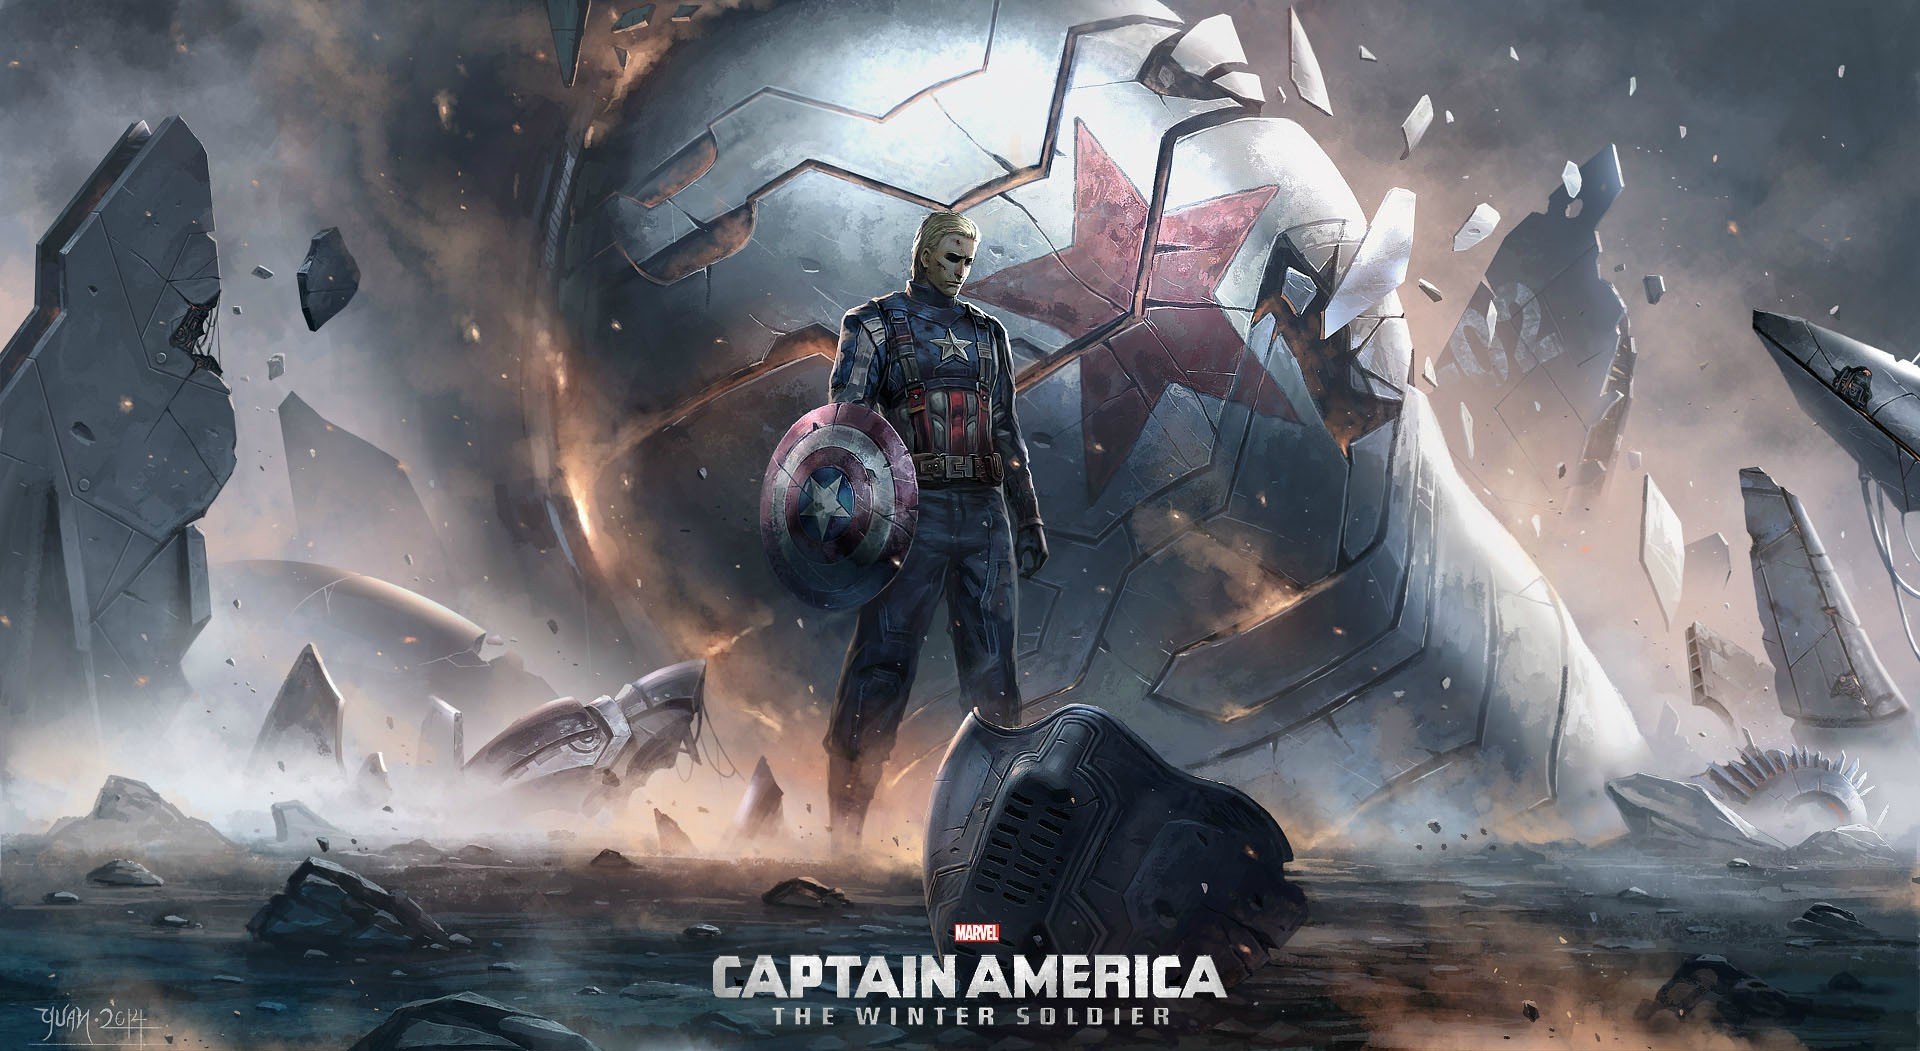 1600x900 Captain America The Winter Soldier Art 1600x900